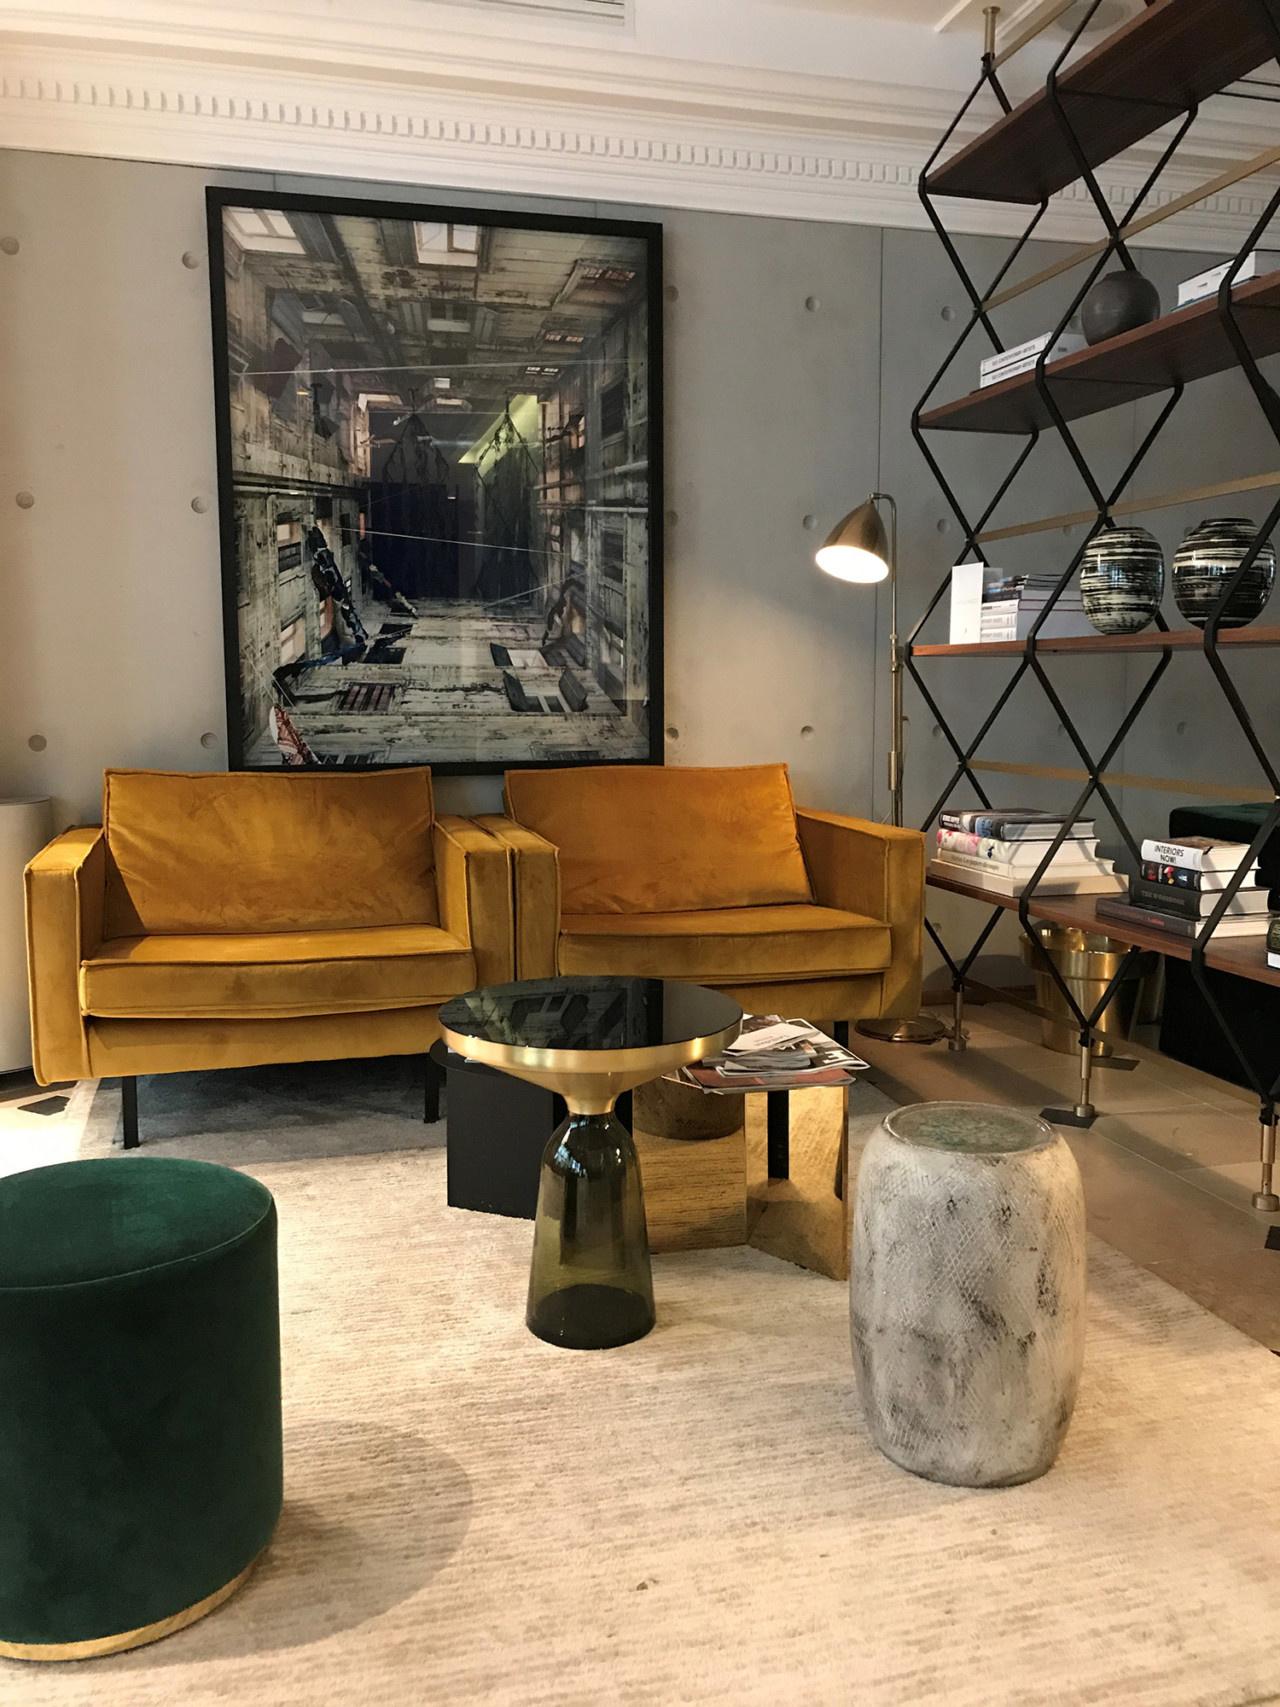 Новый бутик-отель в центре Парижа (галерея 4, фото 1)